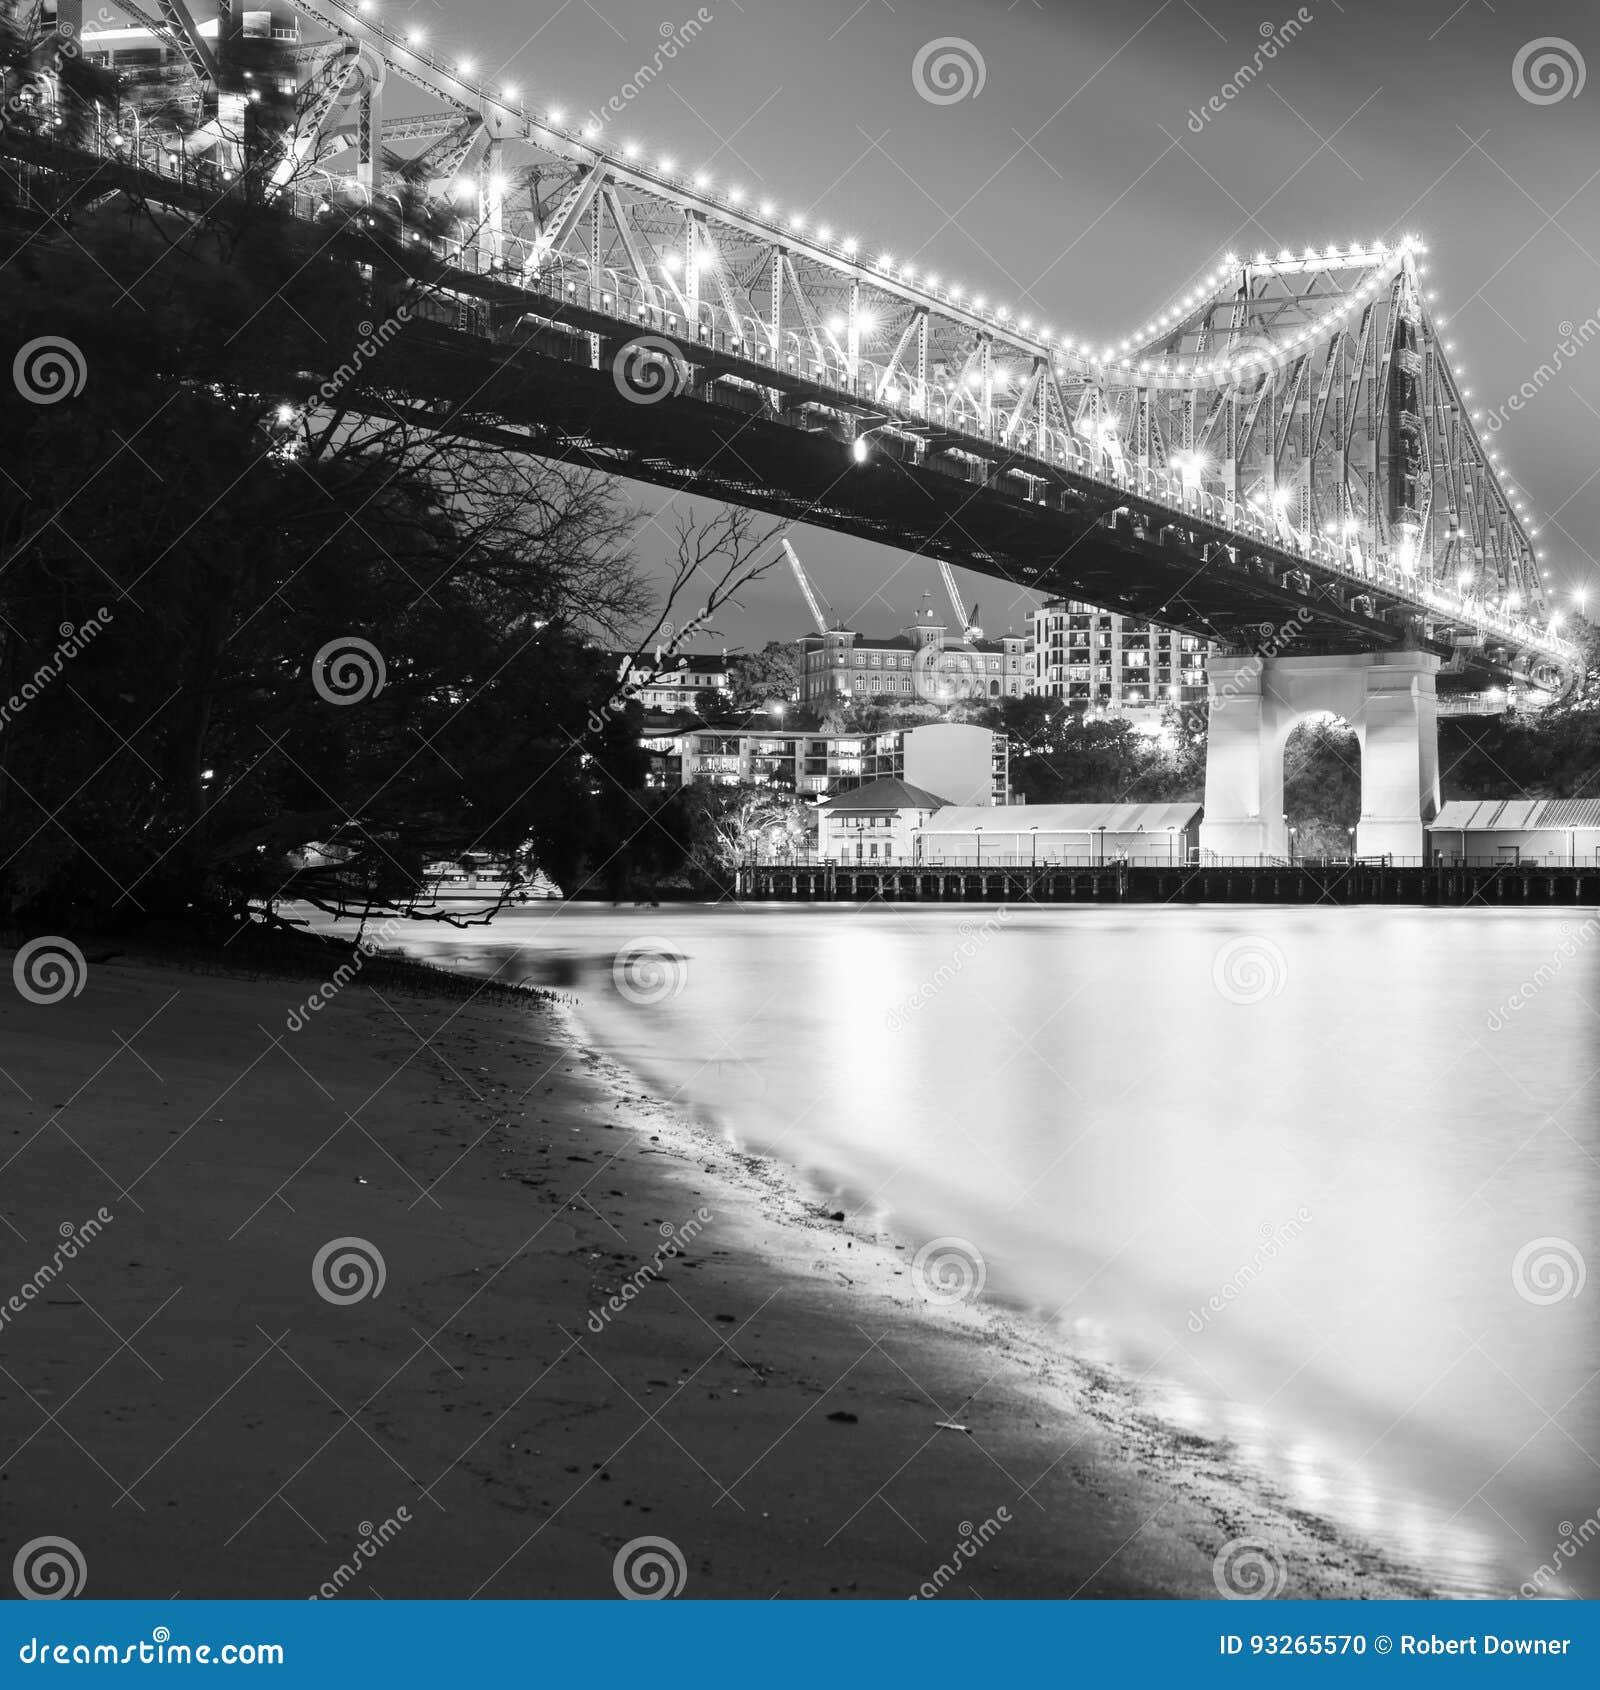 The iconic story bridge in brisbane queensland australia black and white